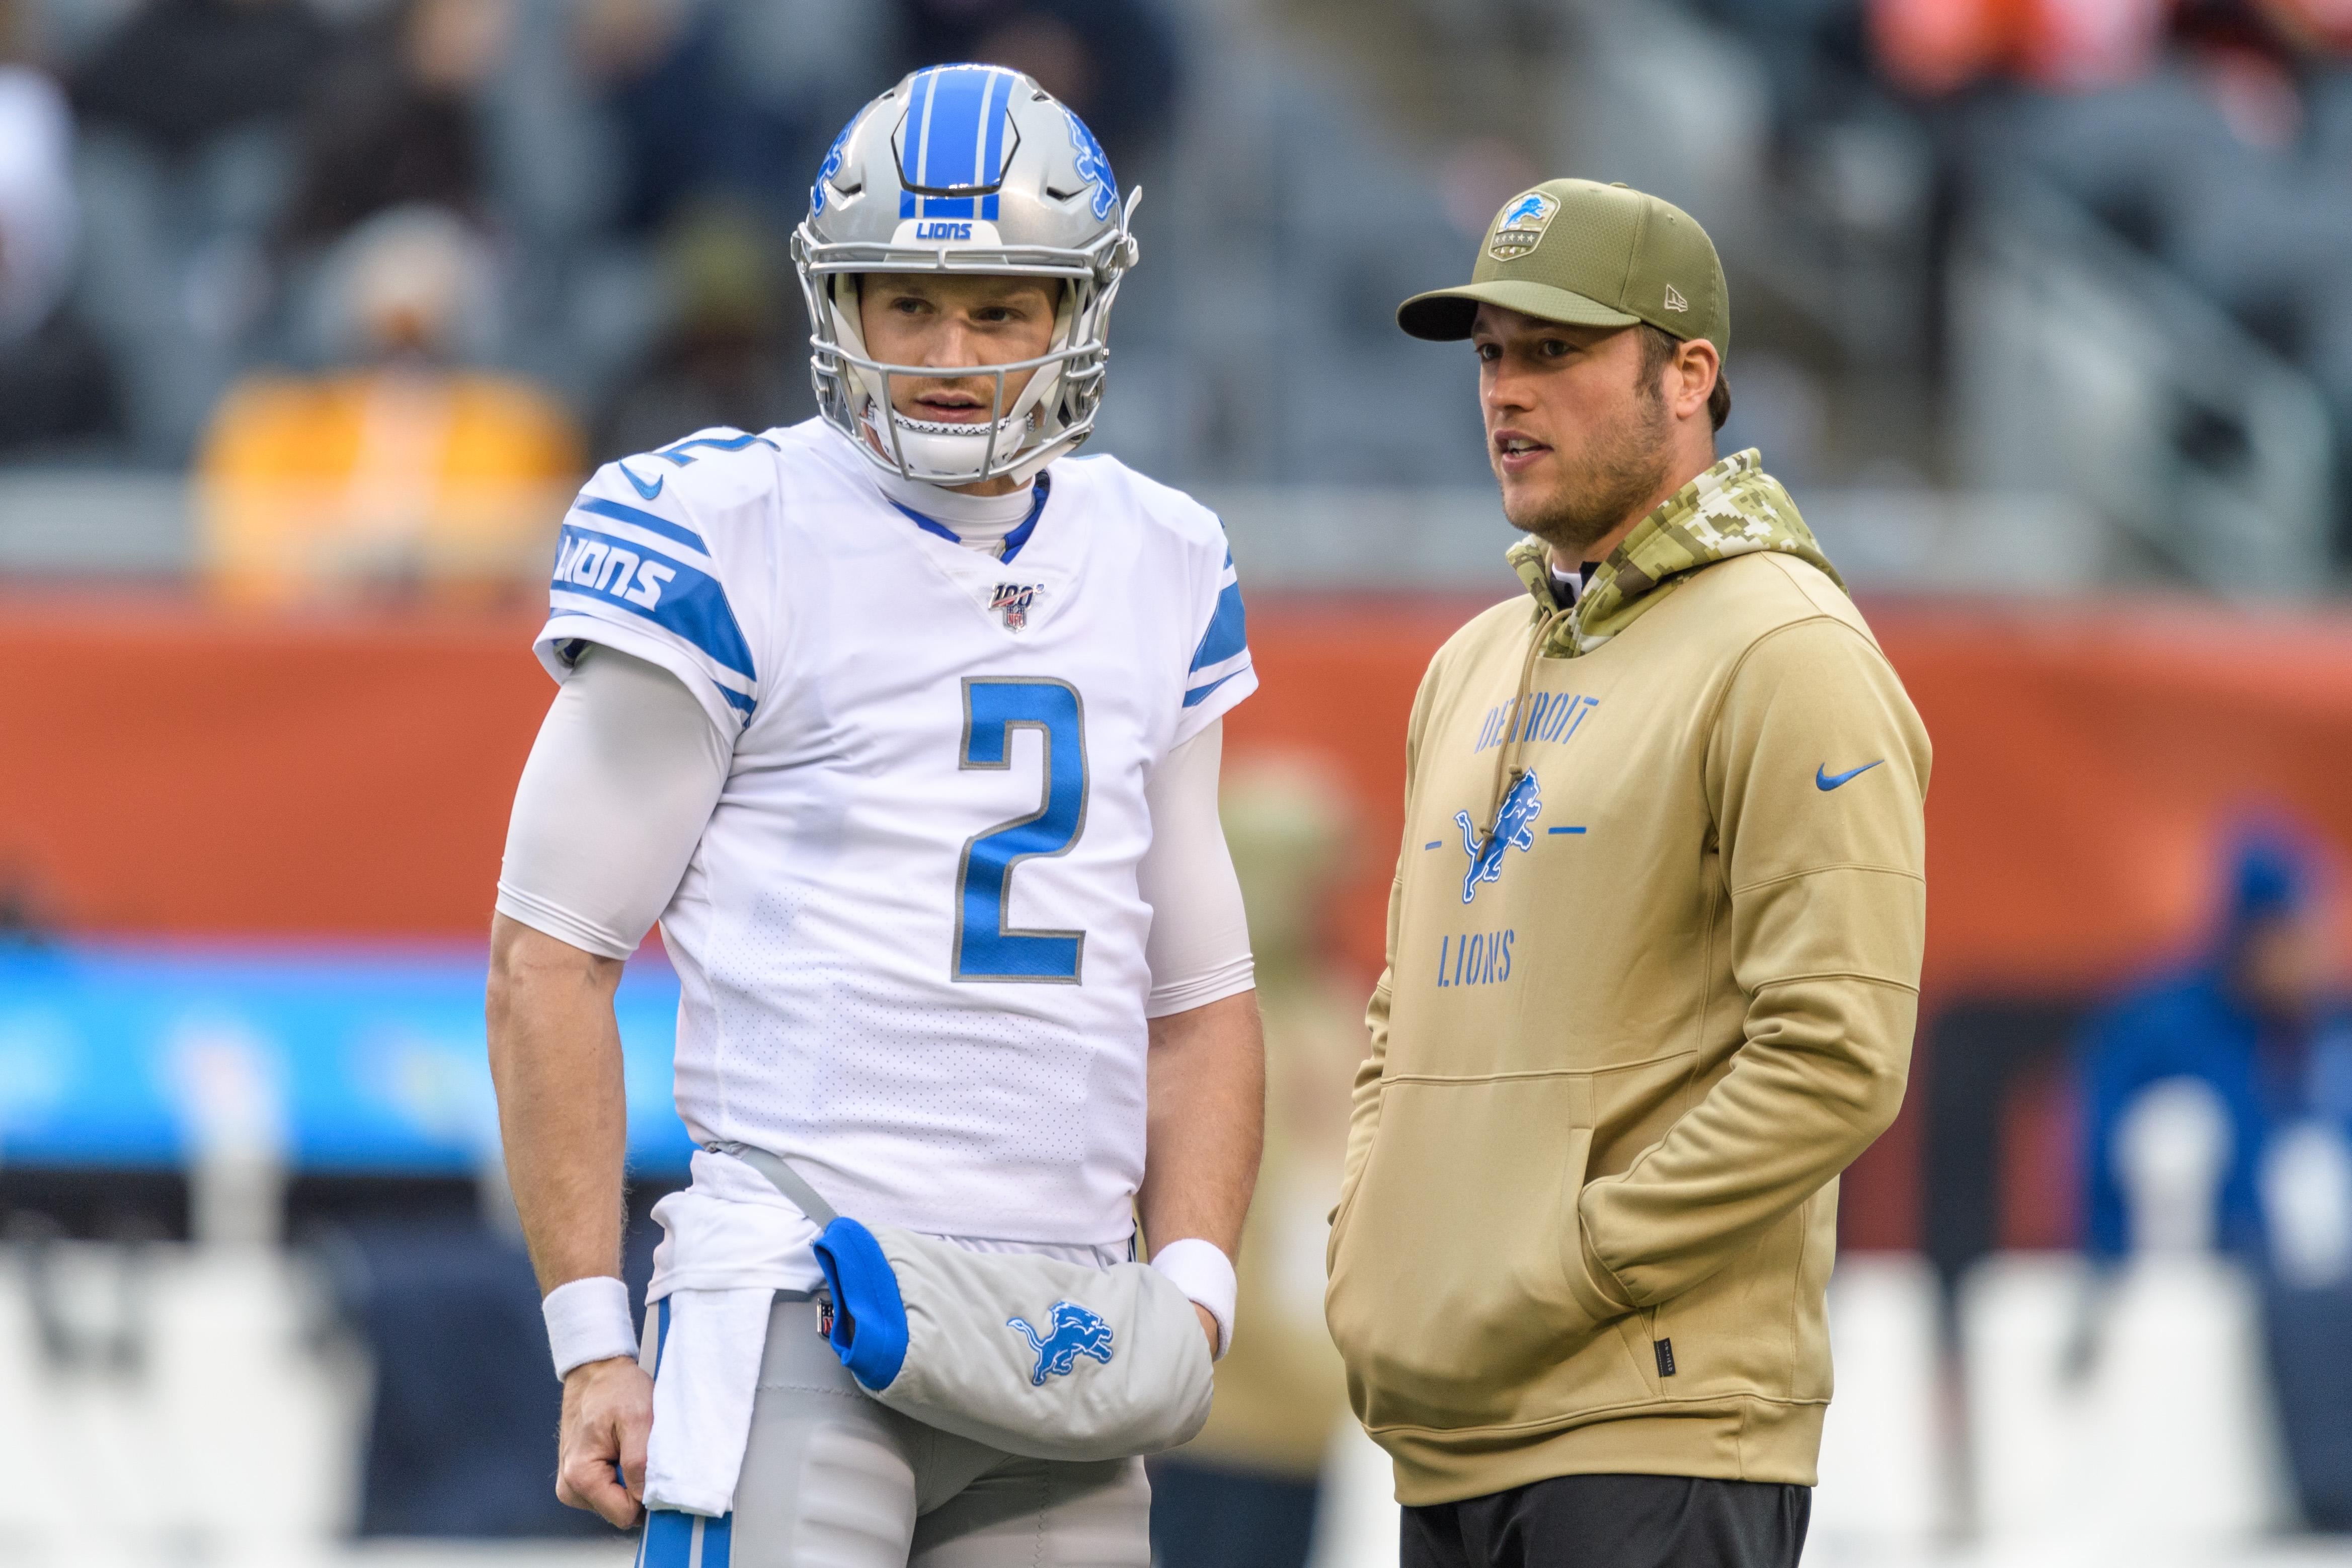 NFL: NOV 10 Lions at Bears